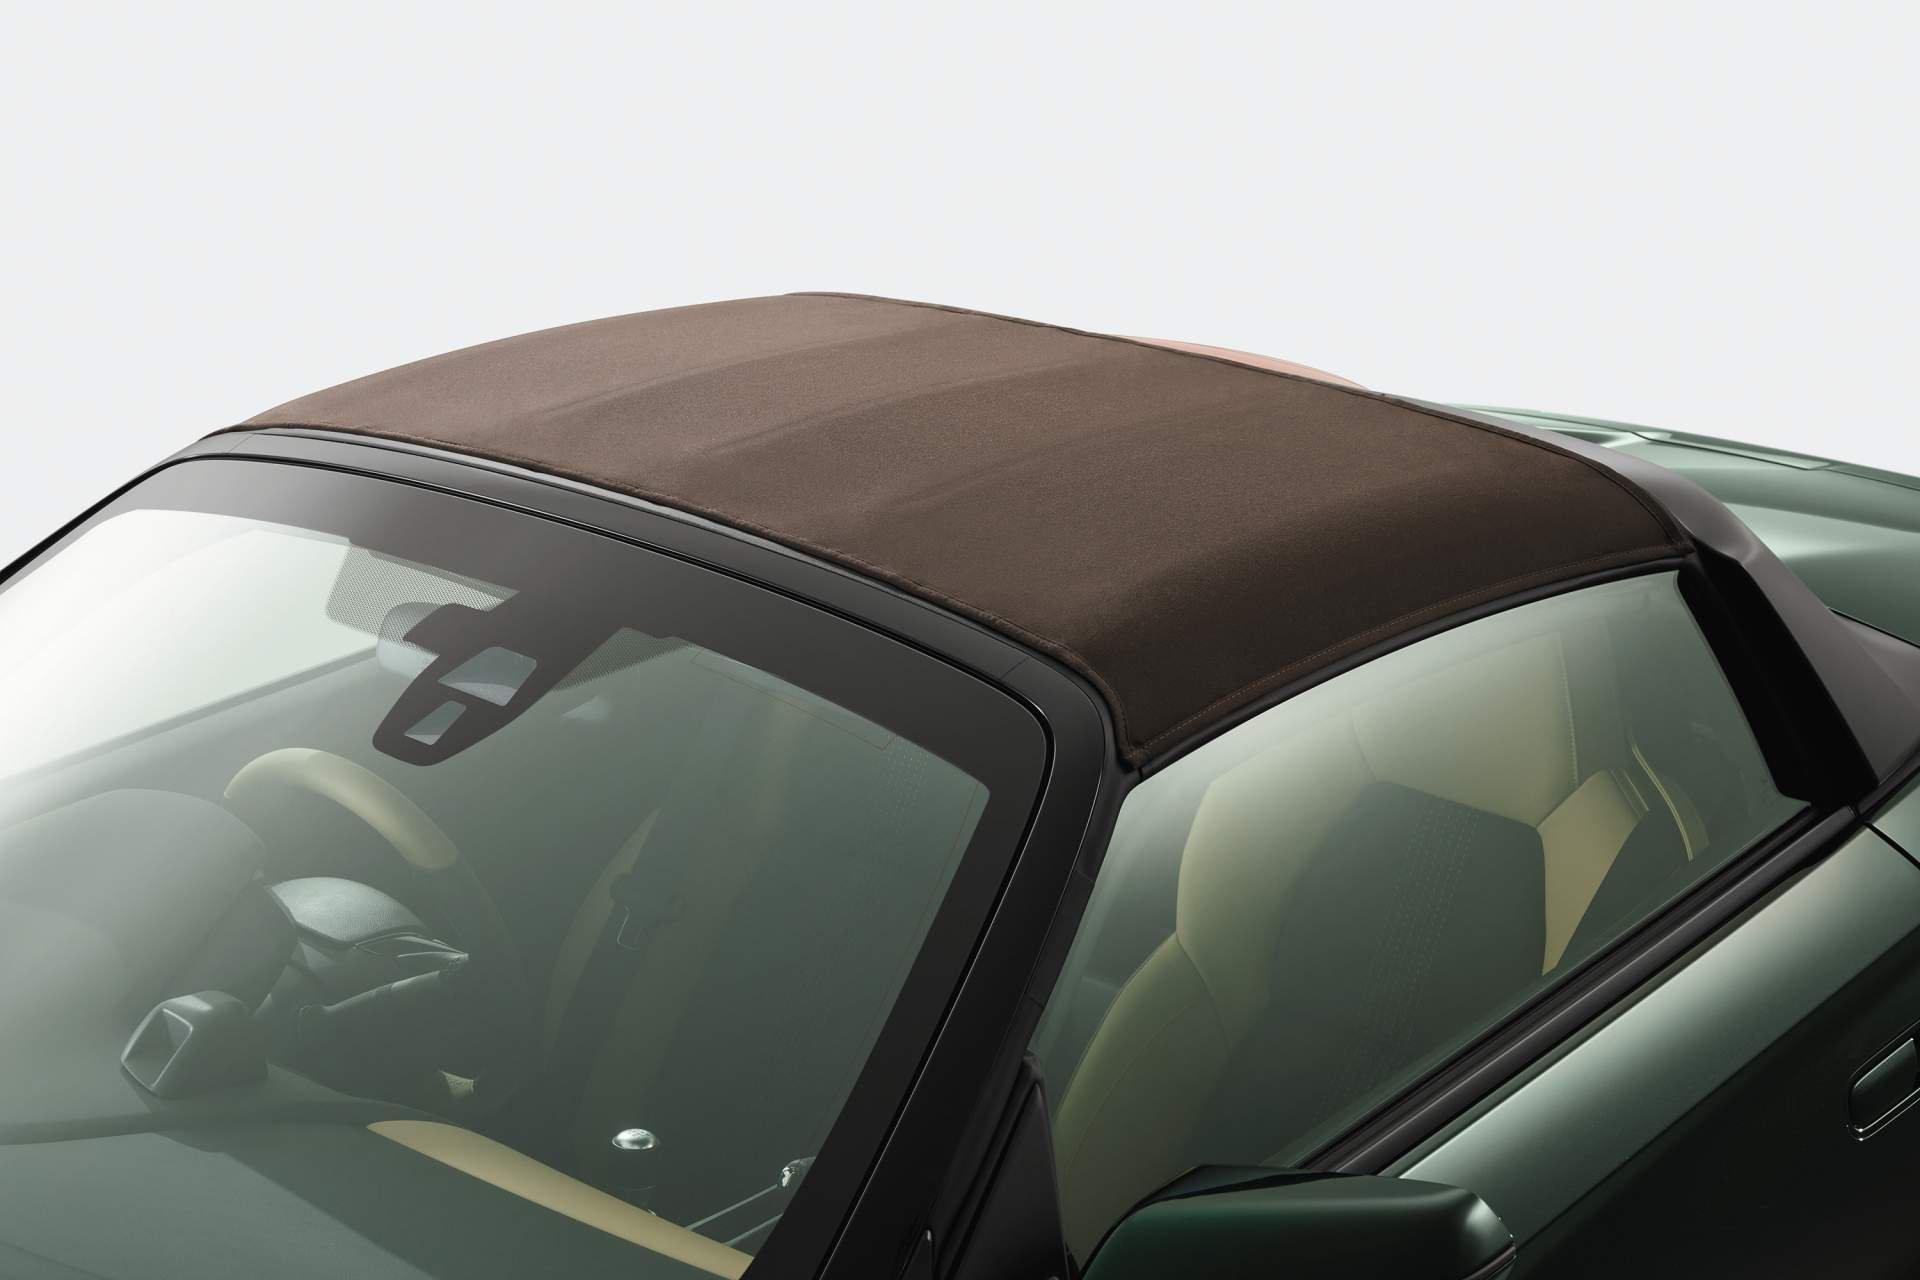 Honda_S660_Trad_Leather_Edition_0000